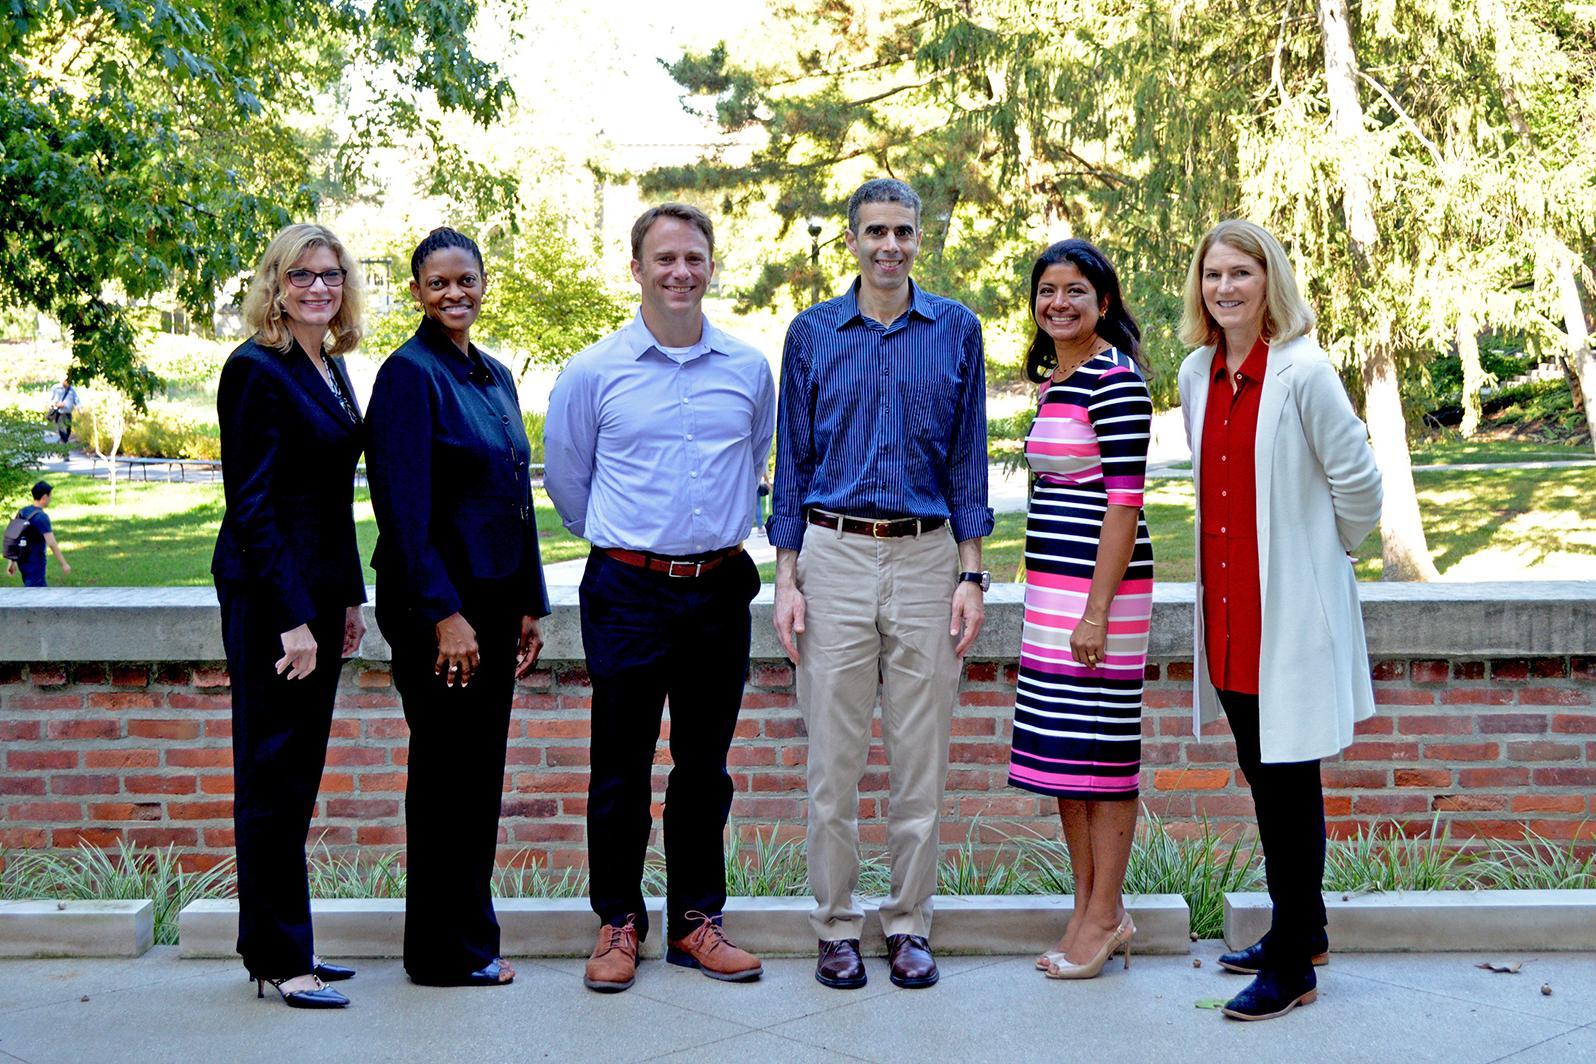 Group photo of the 2019-20 ALP Fellows